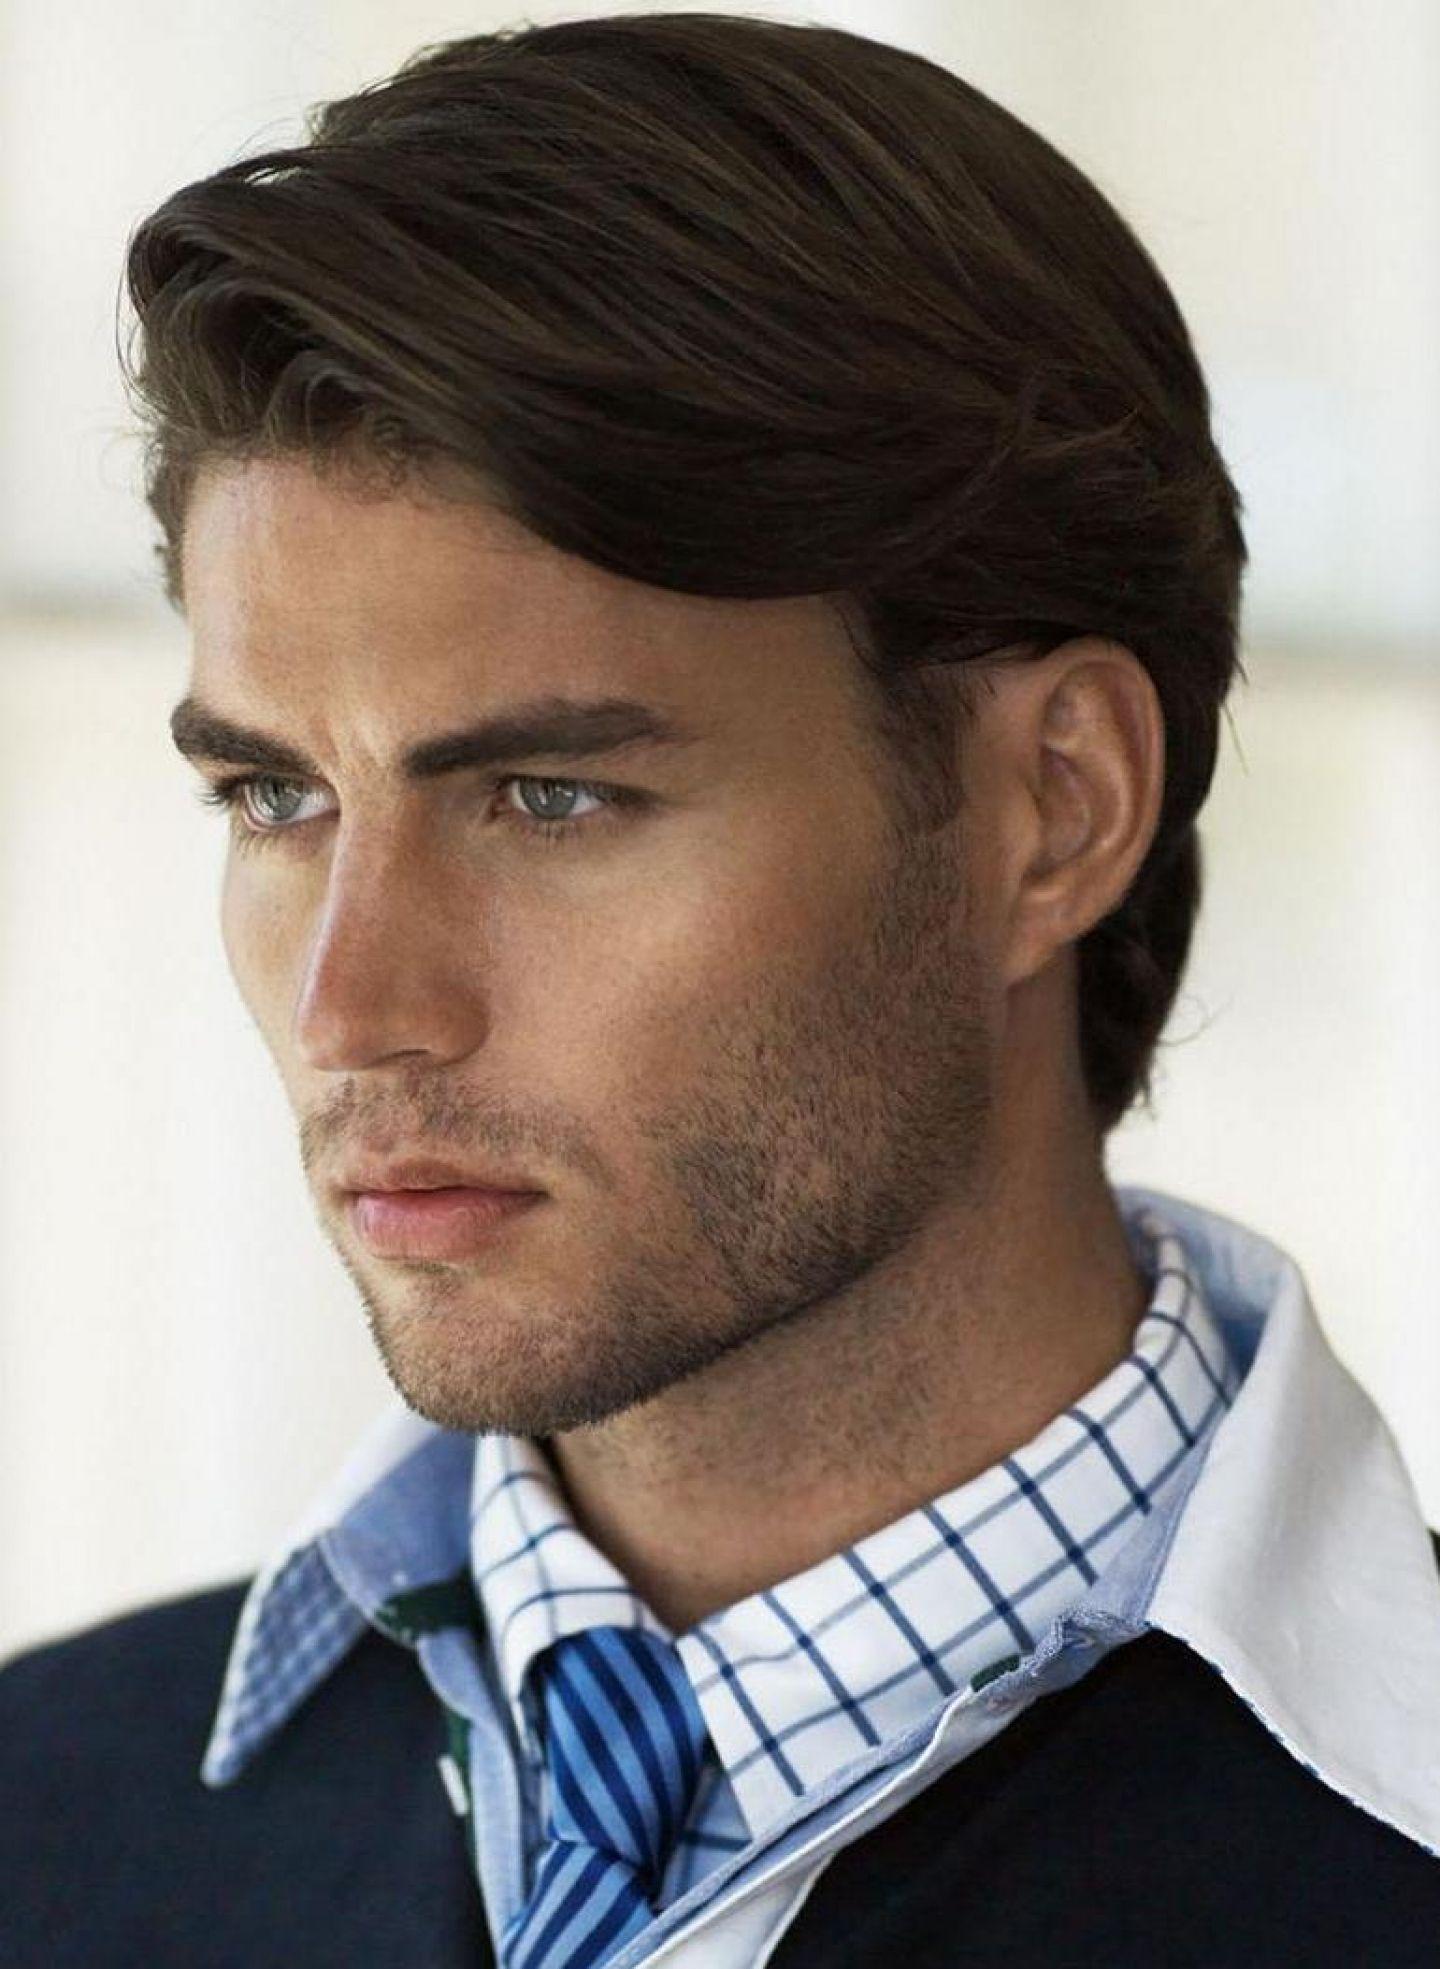 mens haircuts 11  Tags: Chic Medium 11 Hair Styles for Men